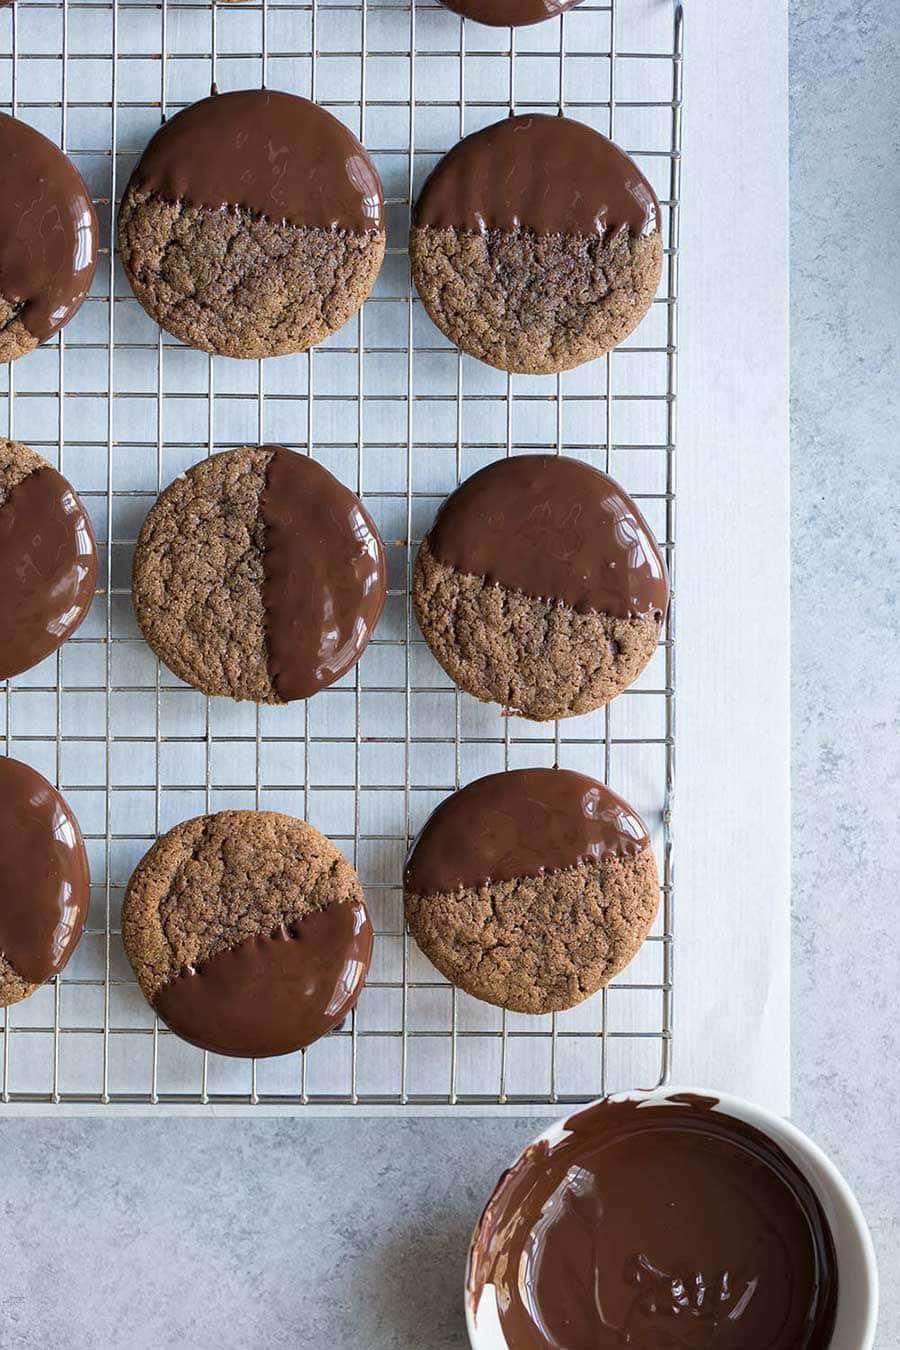 Baked gingerbread cookies freshly dipped in chocolate